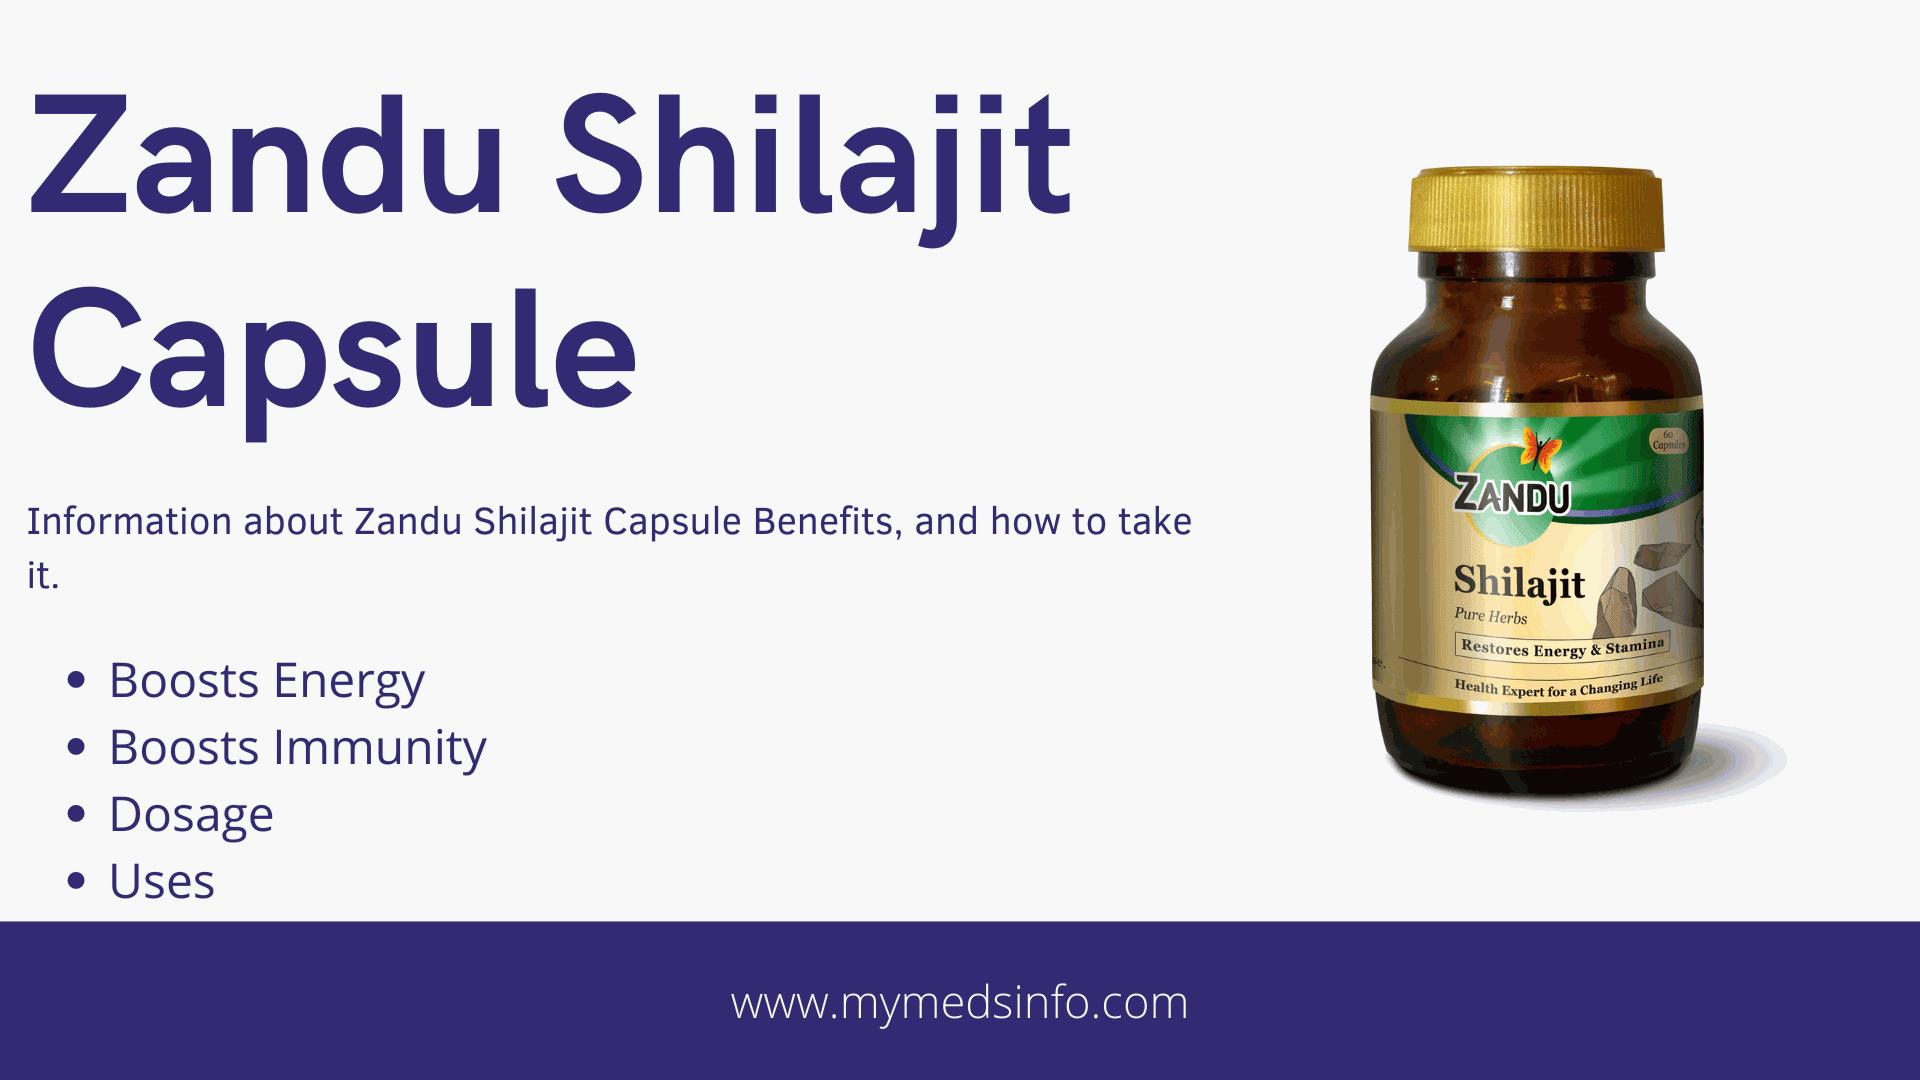 Zandu Shilajit Capsule Benefits In Hindi - mymedsinfo.com